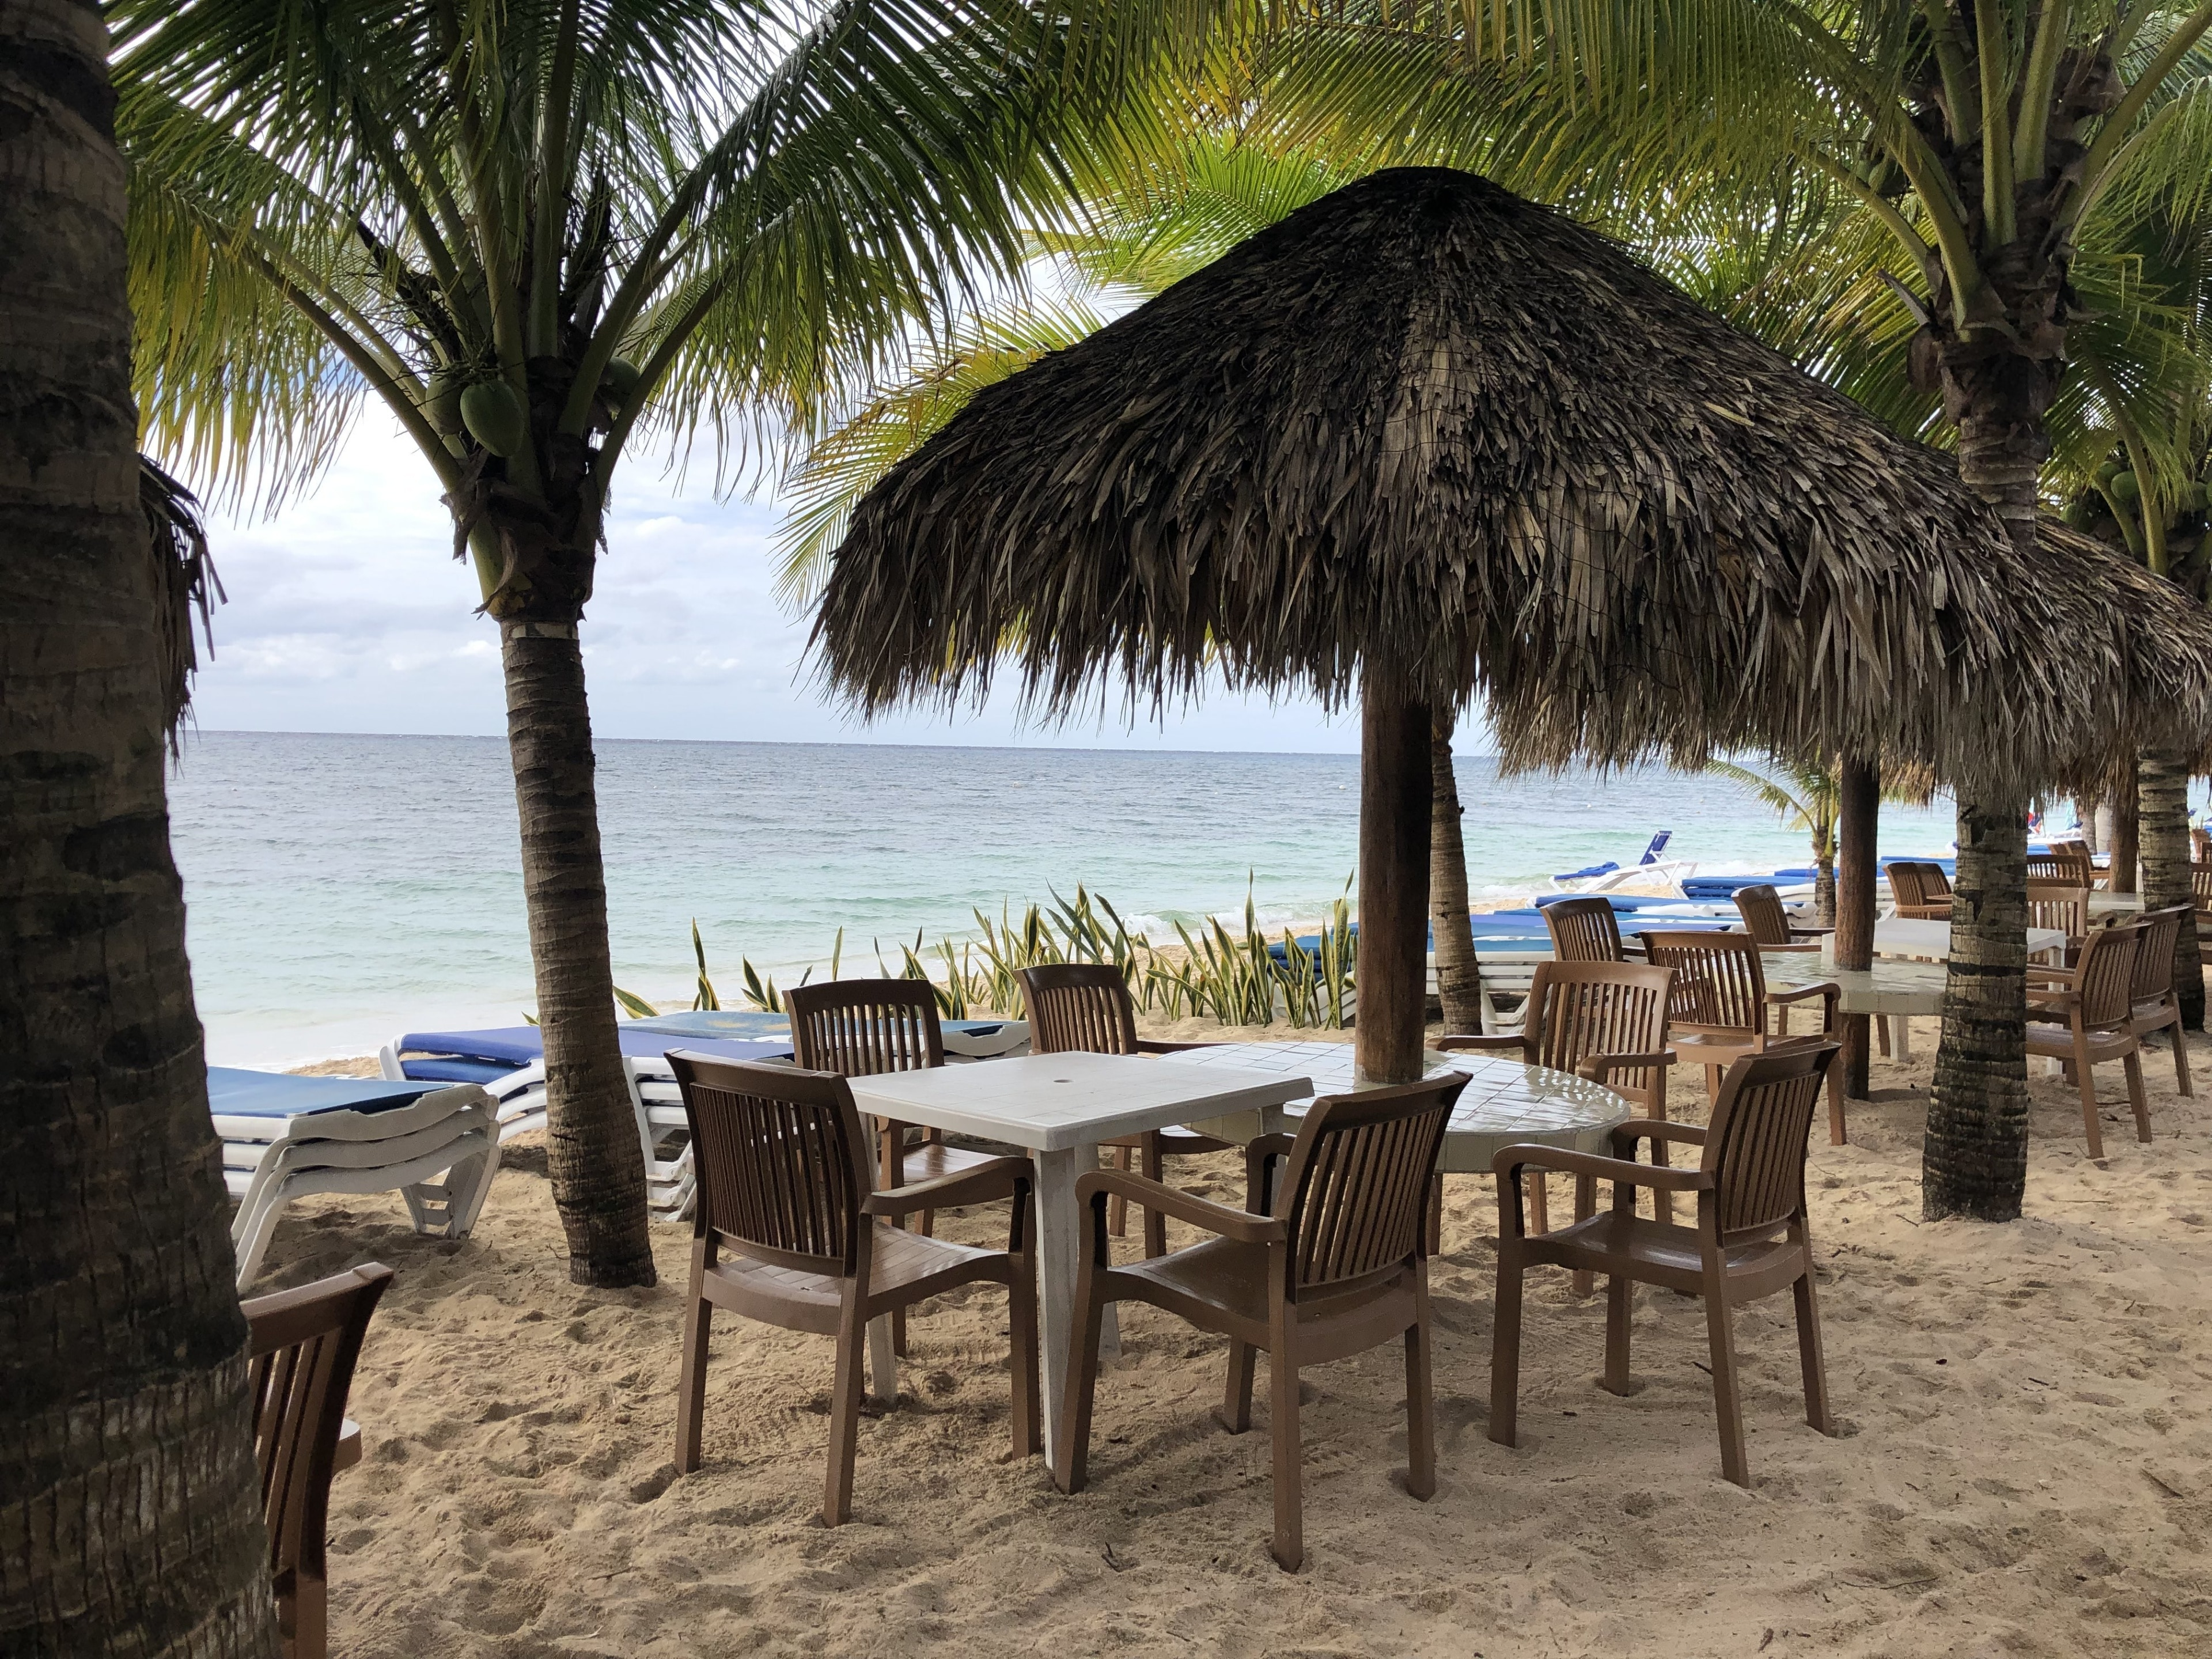 Mr. Sancho's Beach Club, Cozumel, Quintana Roo, Mexico